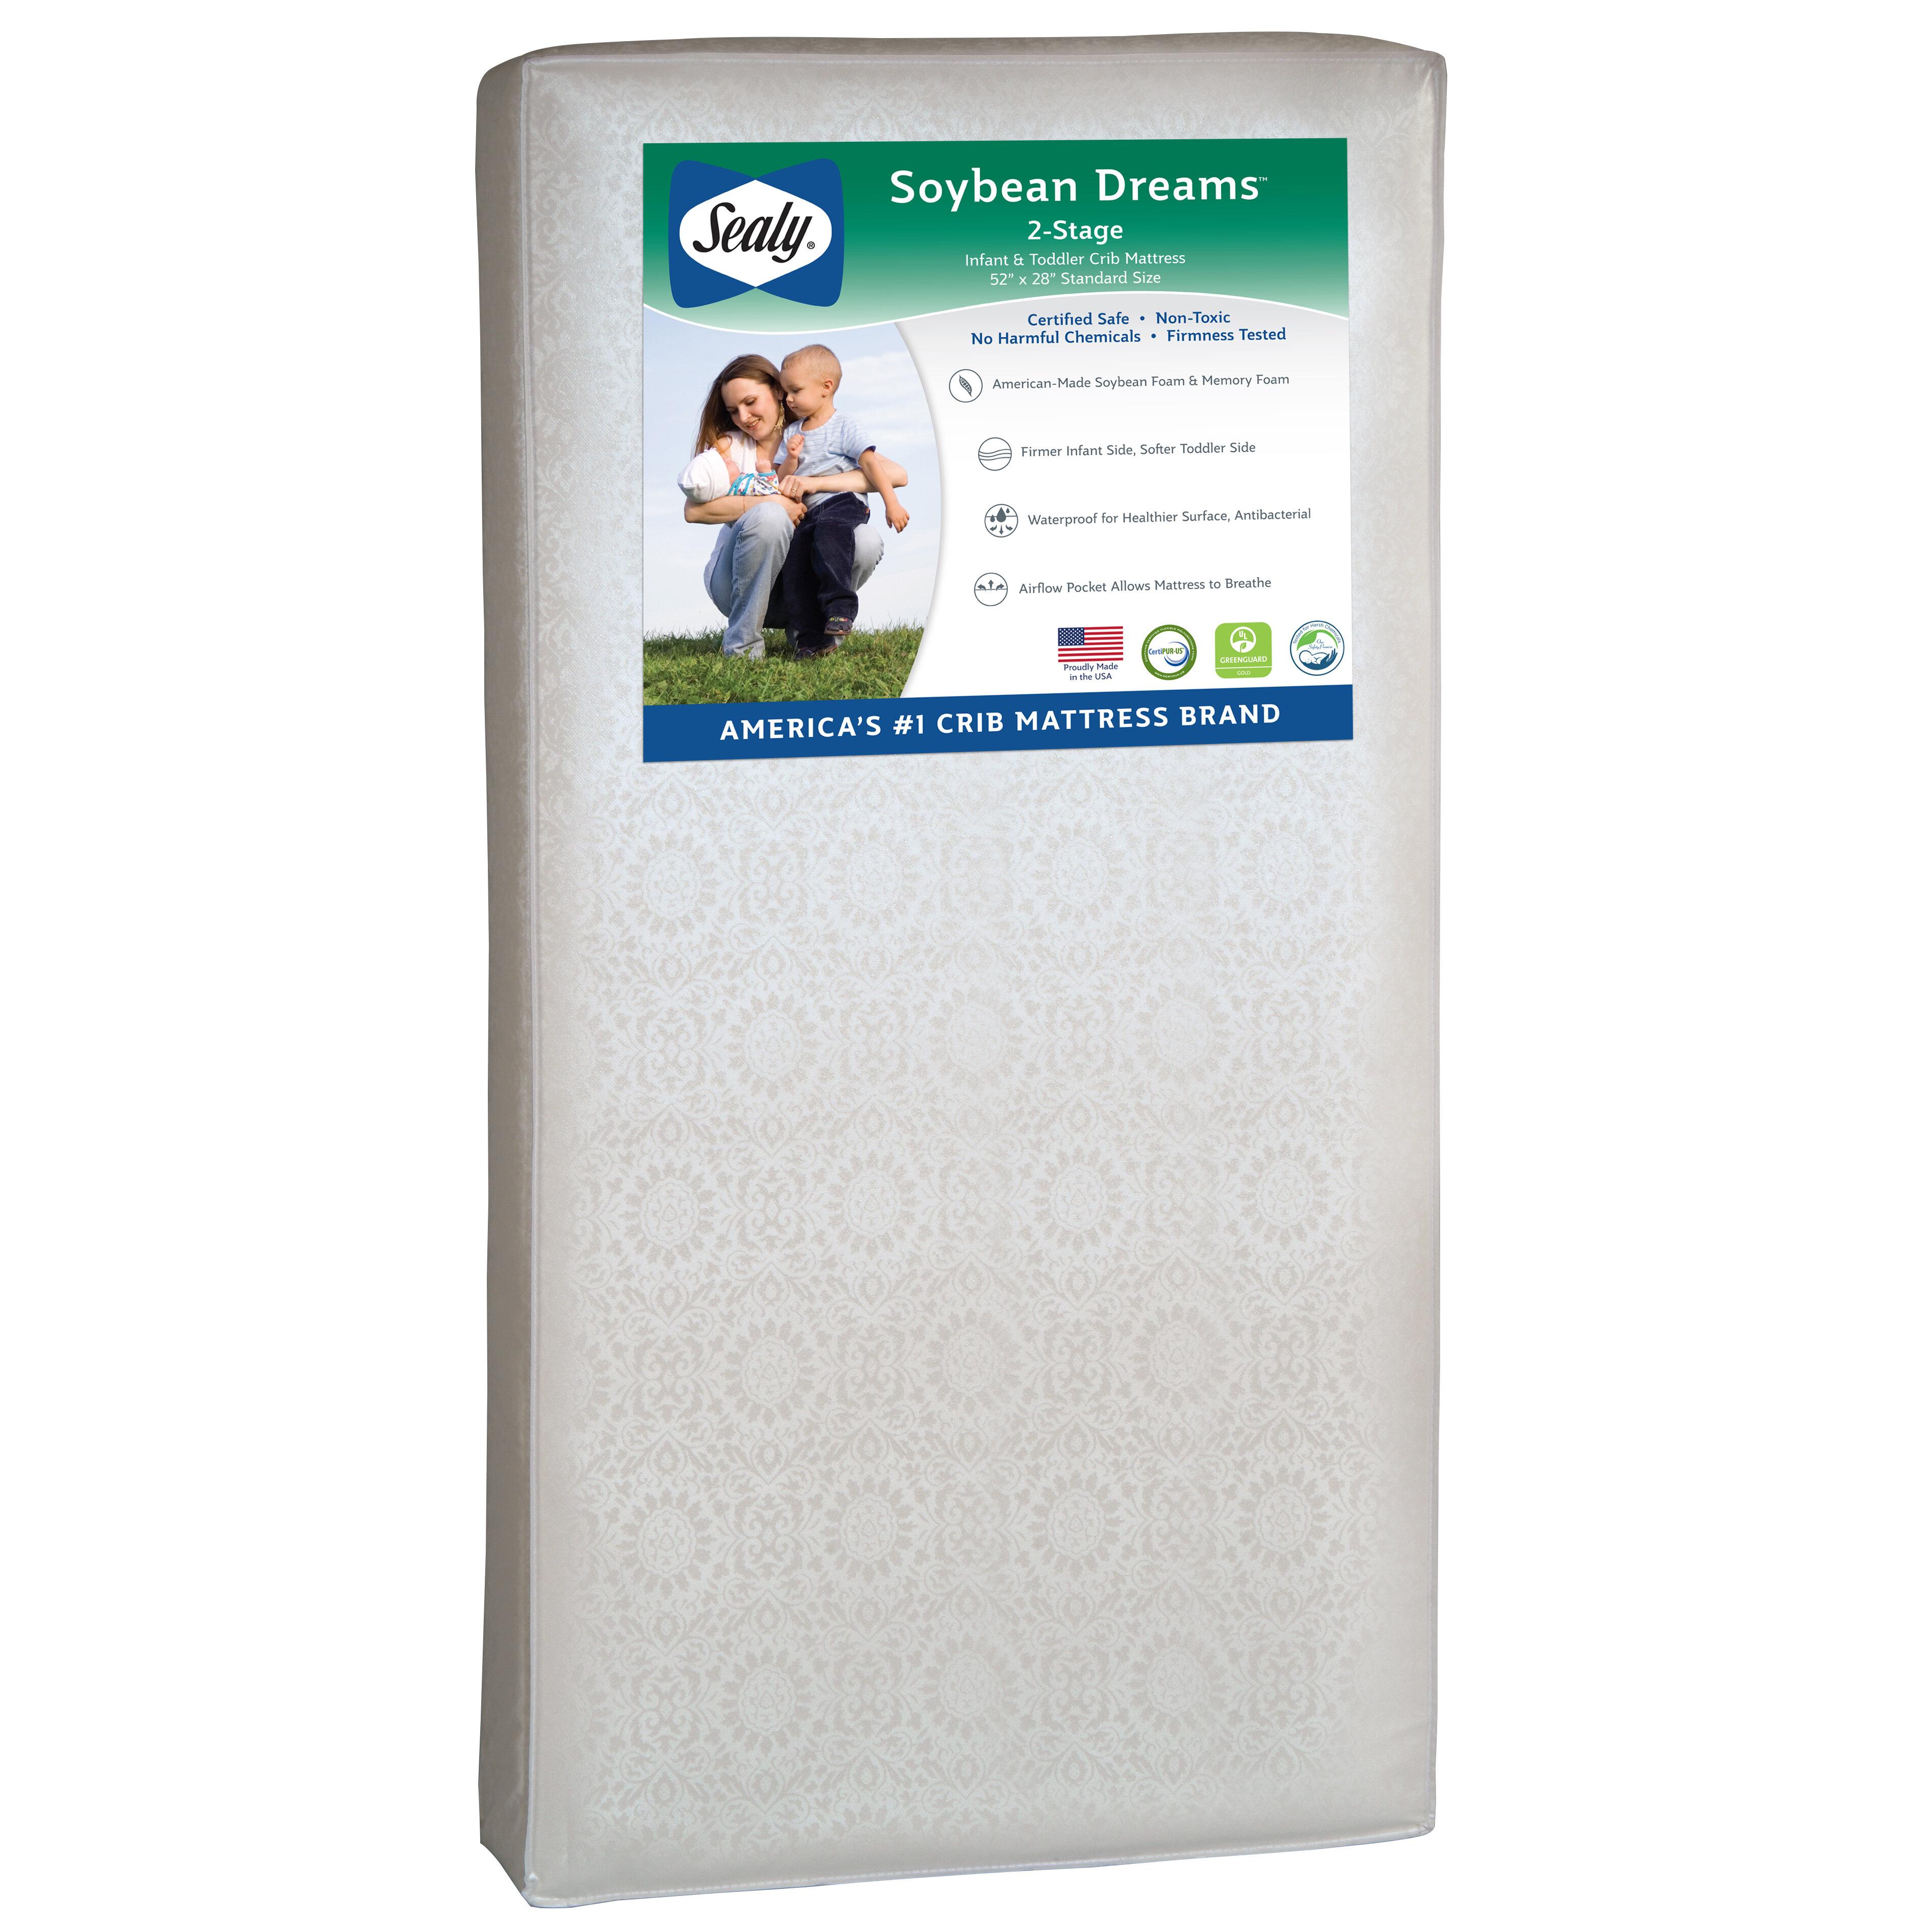 Sealy Soybean Dreams 2 Stage Waterproof Standard Toddler Crib Mattress Reviews Wayfair